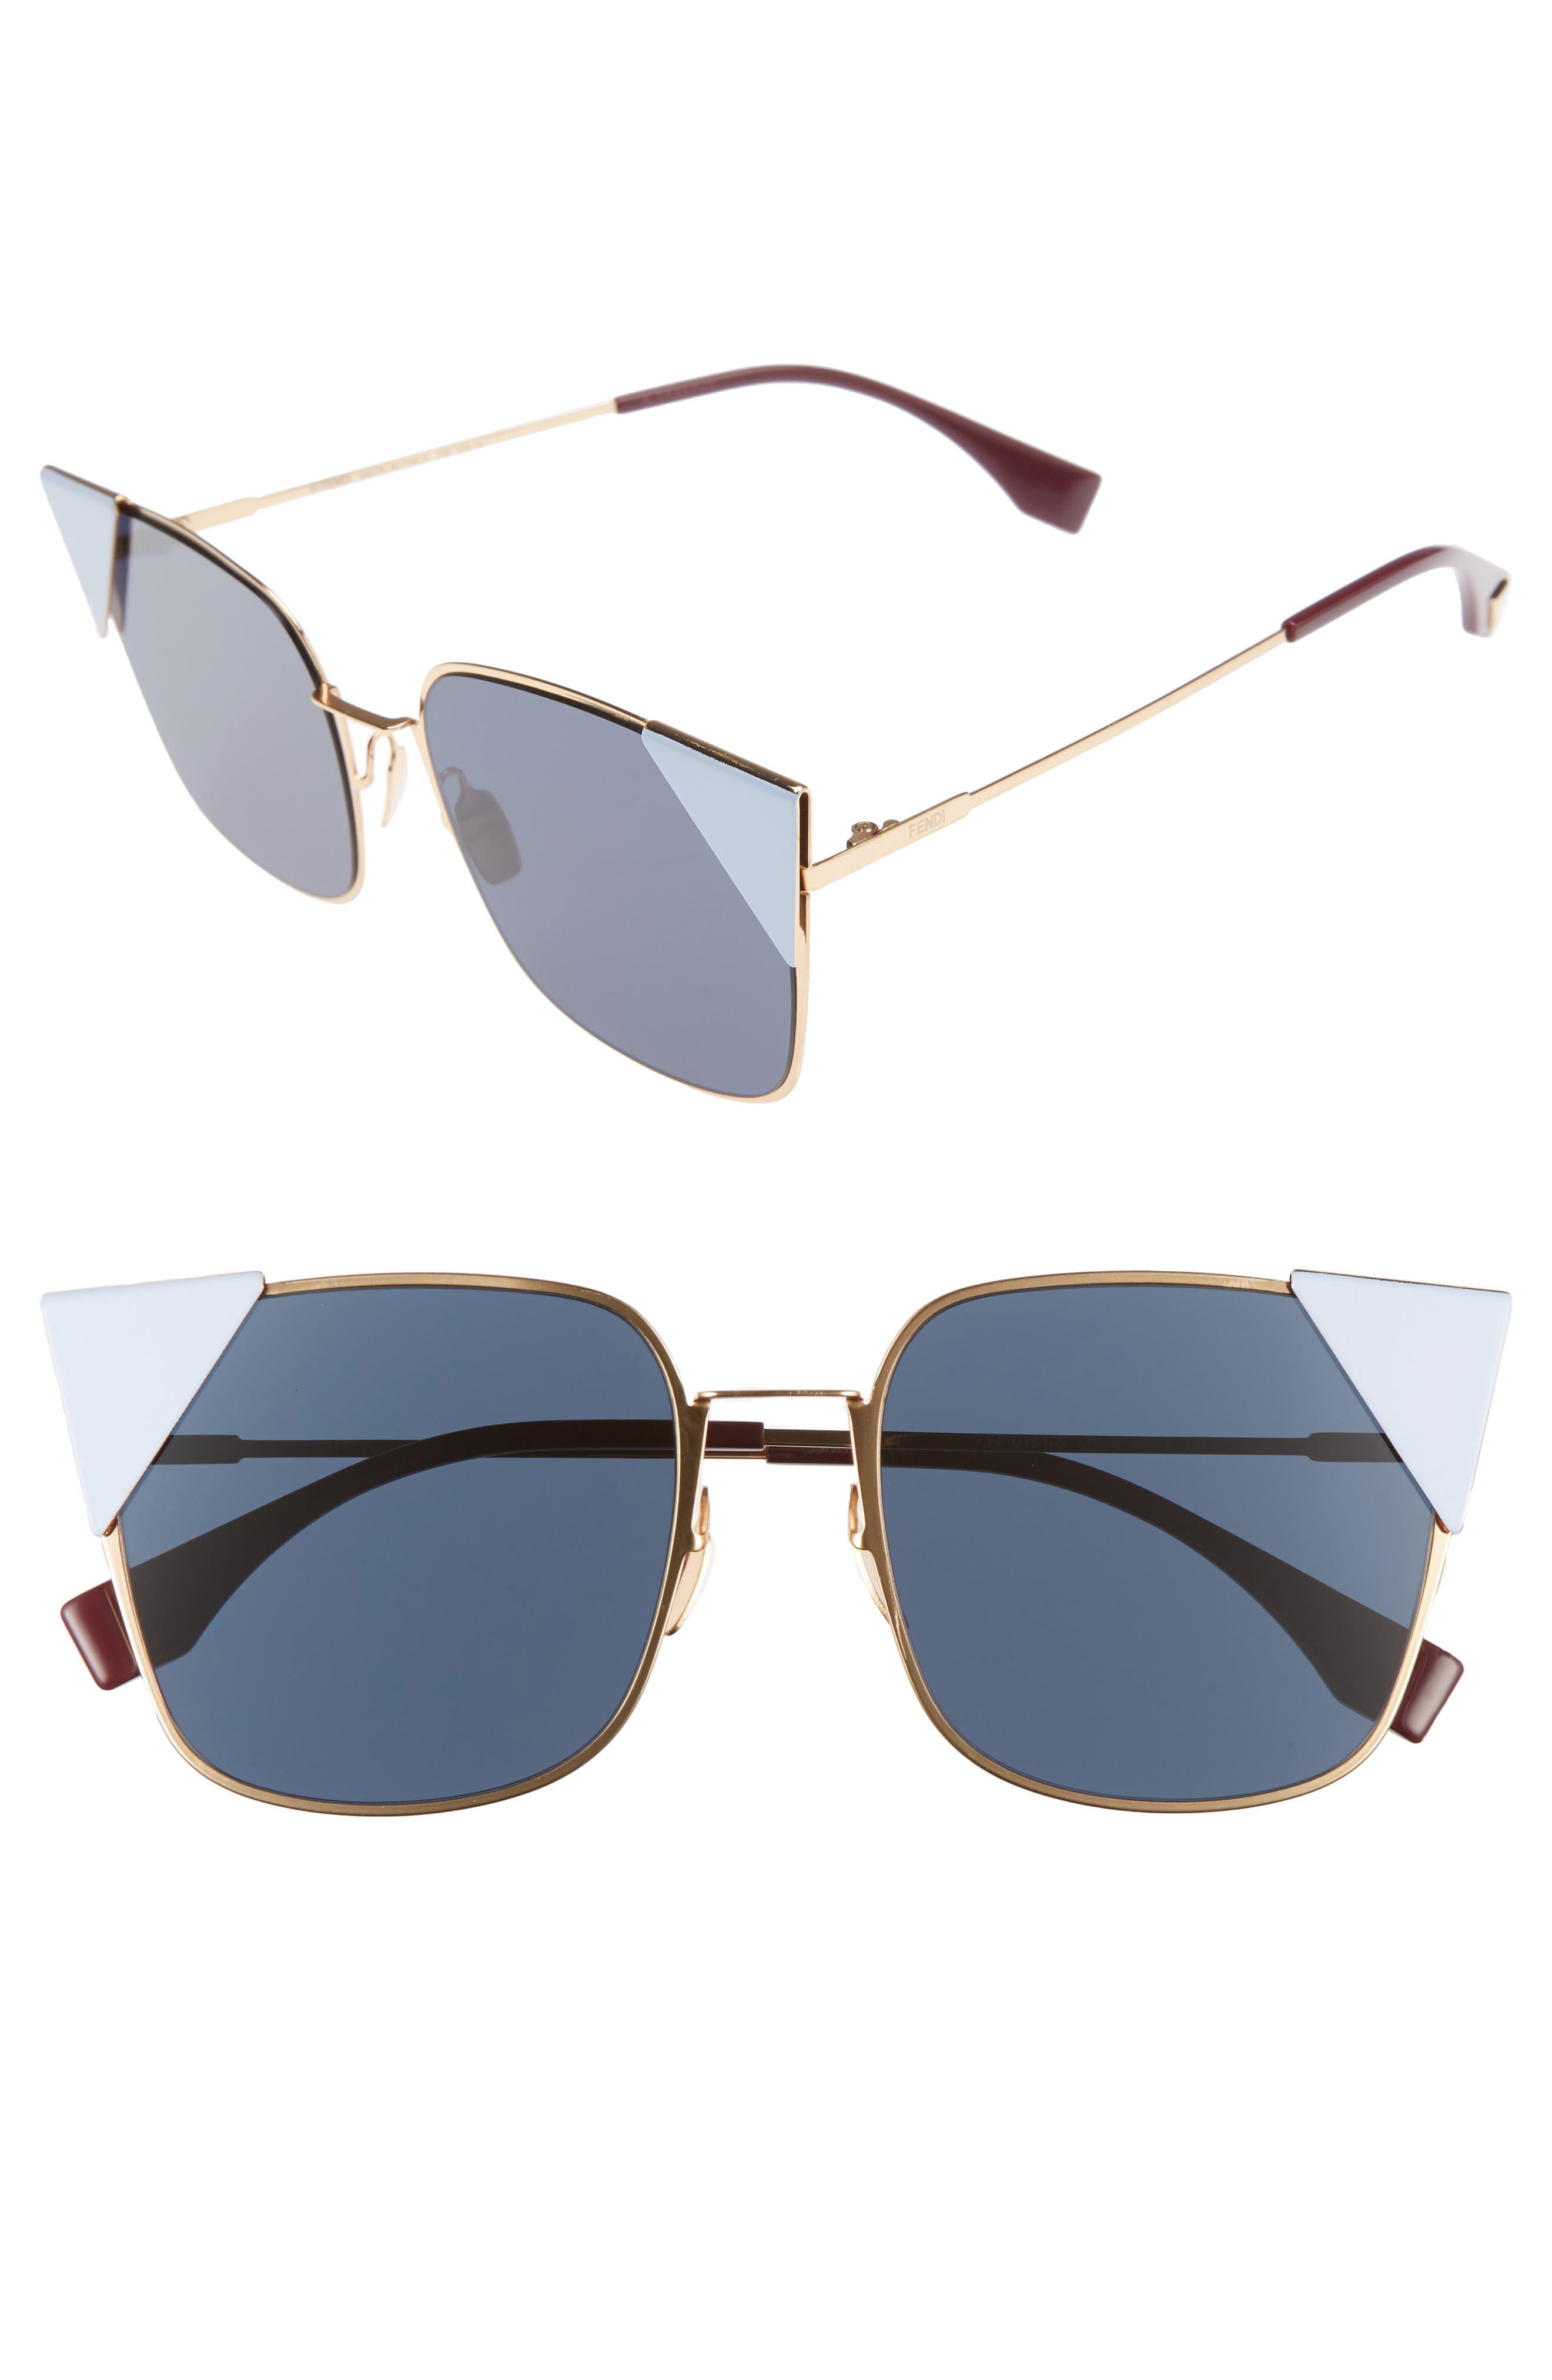 55mm Tipped Cat Eye Sunglasses,                             Alternate thumbnail 4, color,                             ROSE METALLIC GOLD